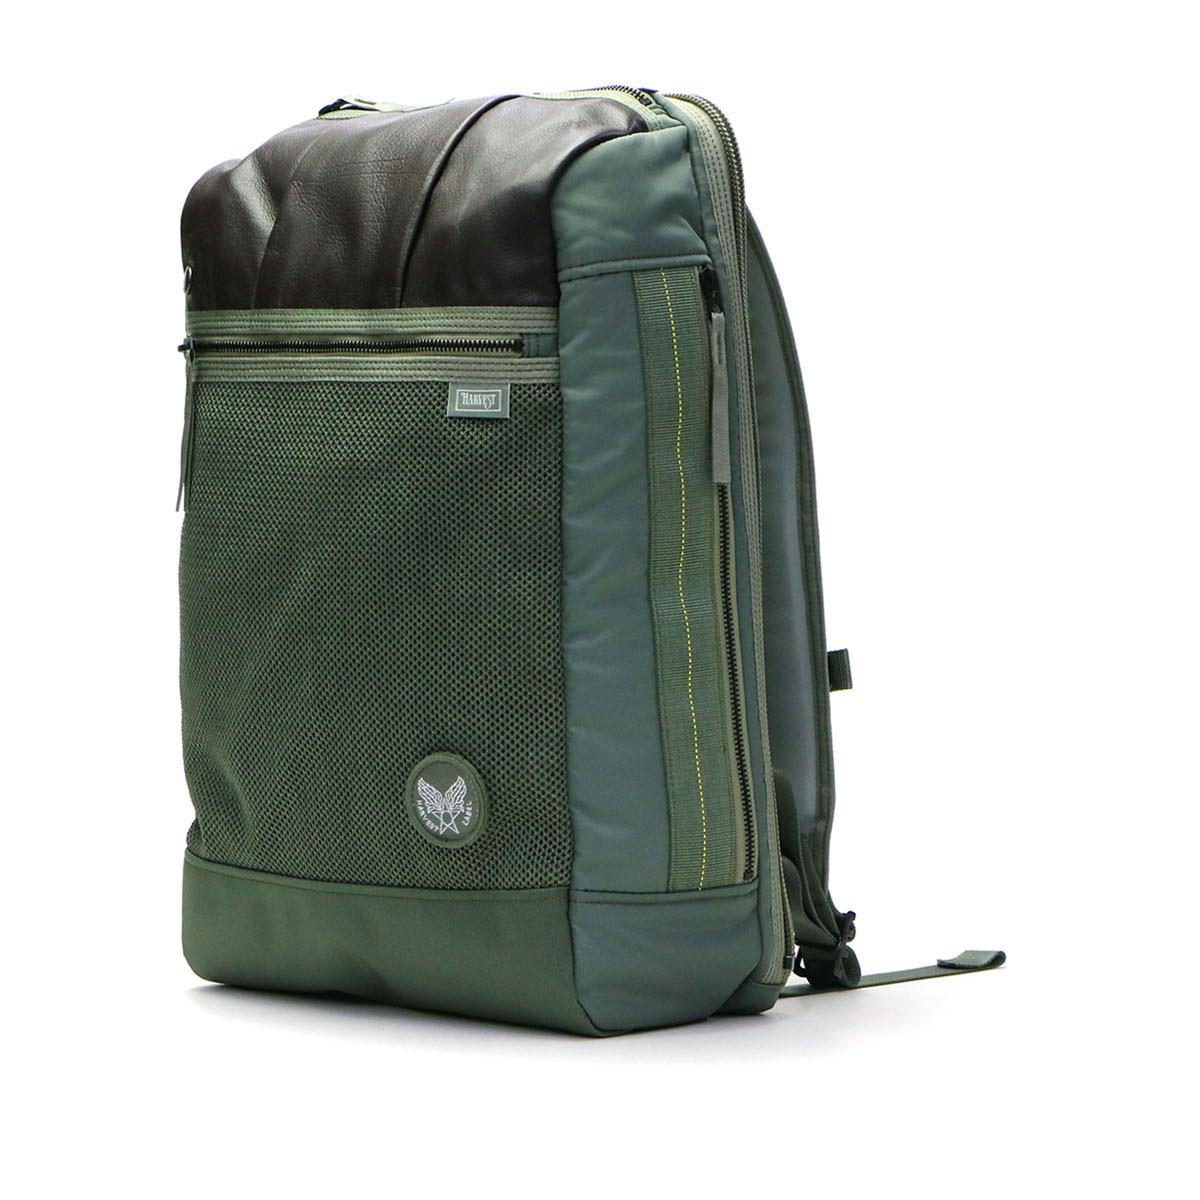 GALLERIA Bag-Luggage: HARVEST LABEL CUSTOM Custom BACKPACK